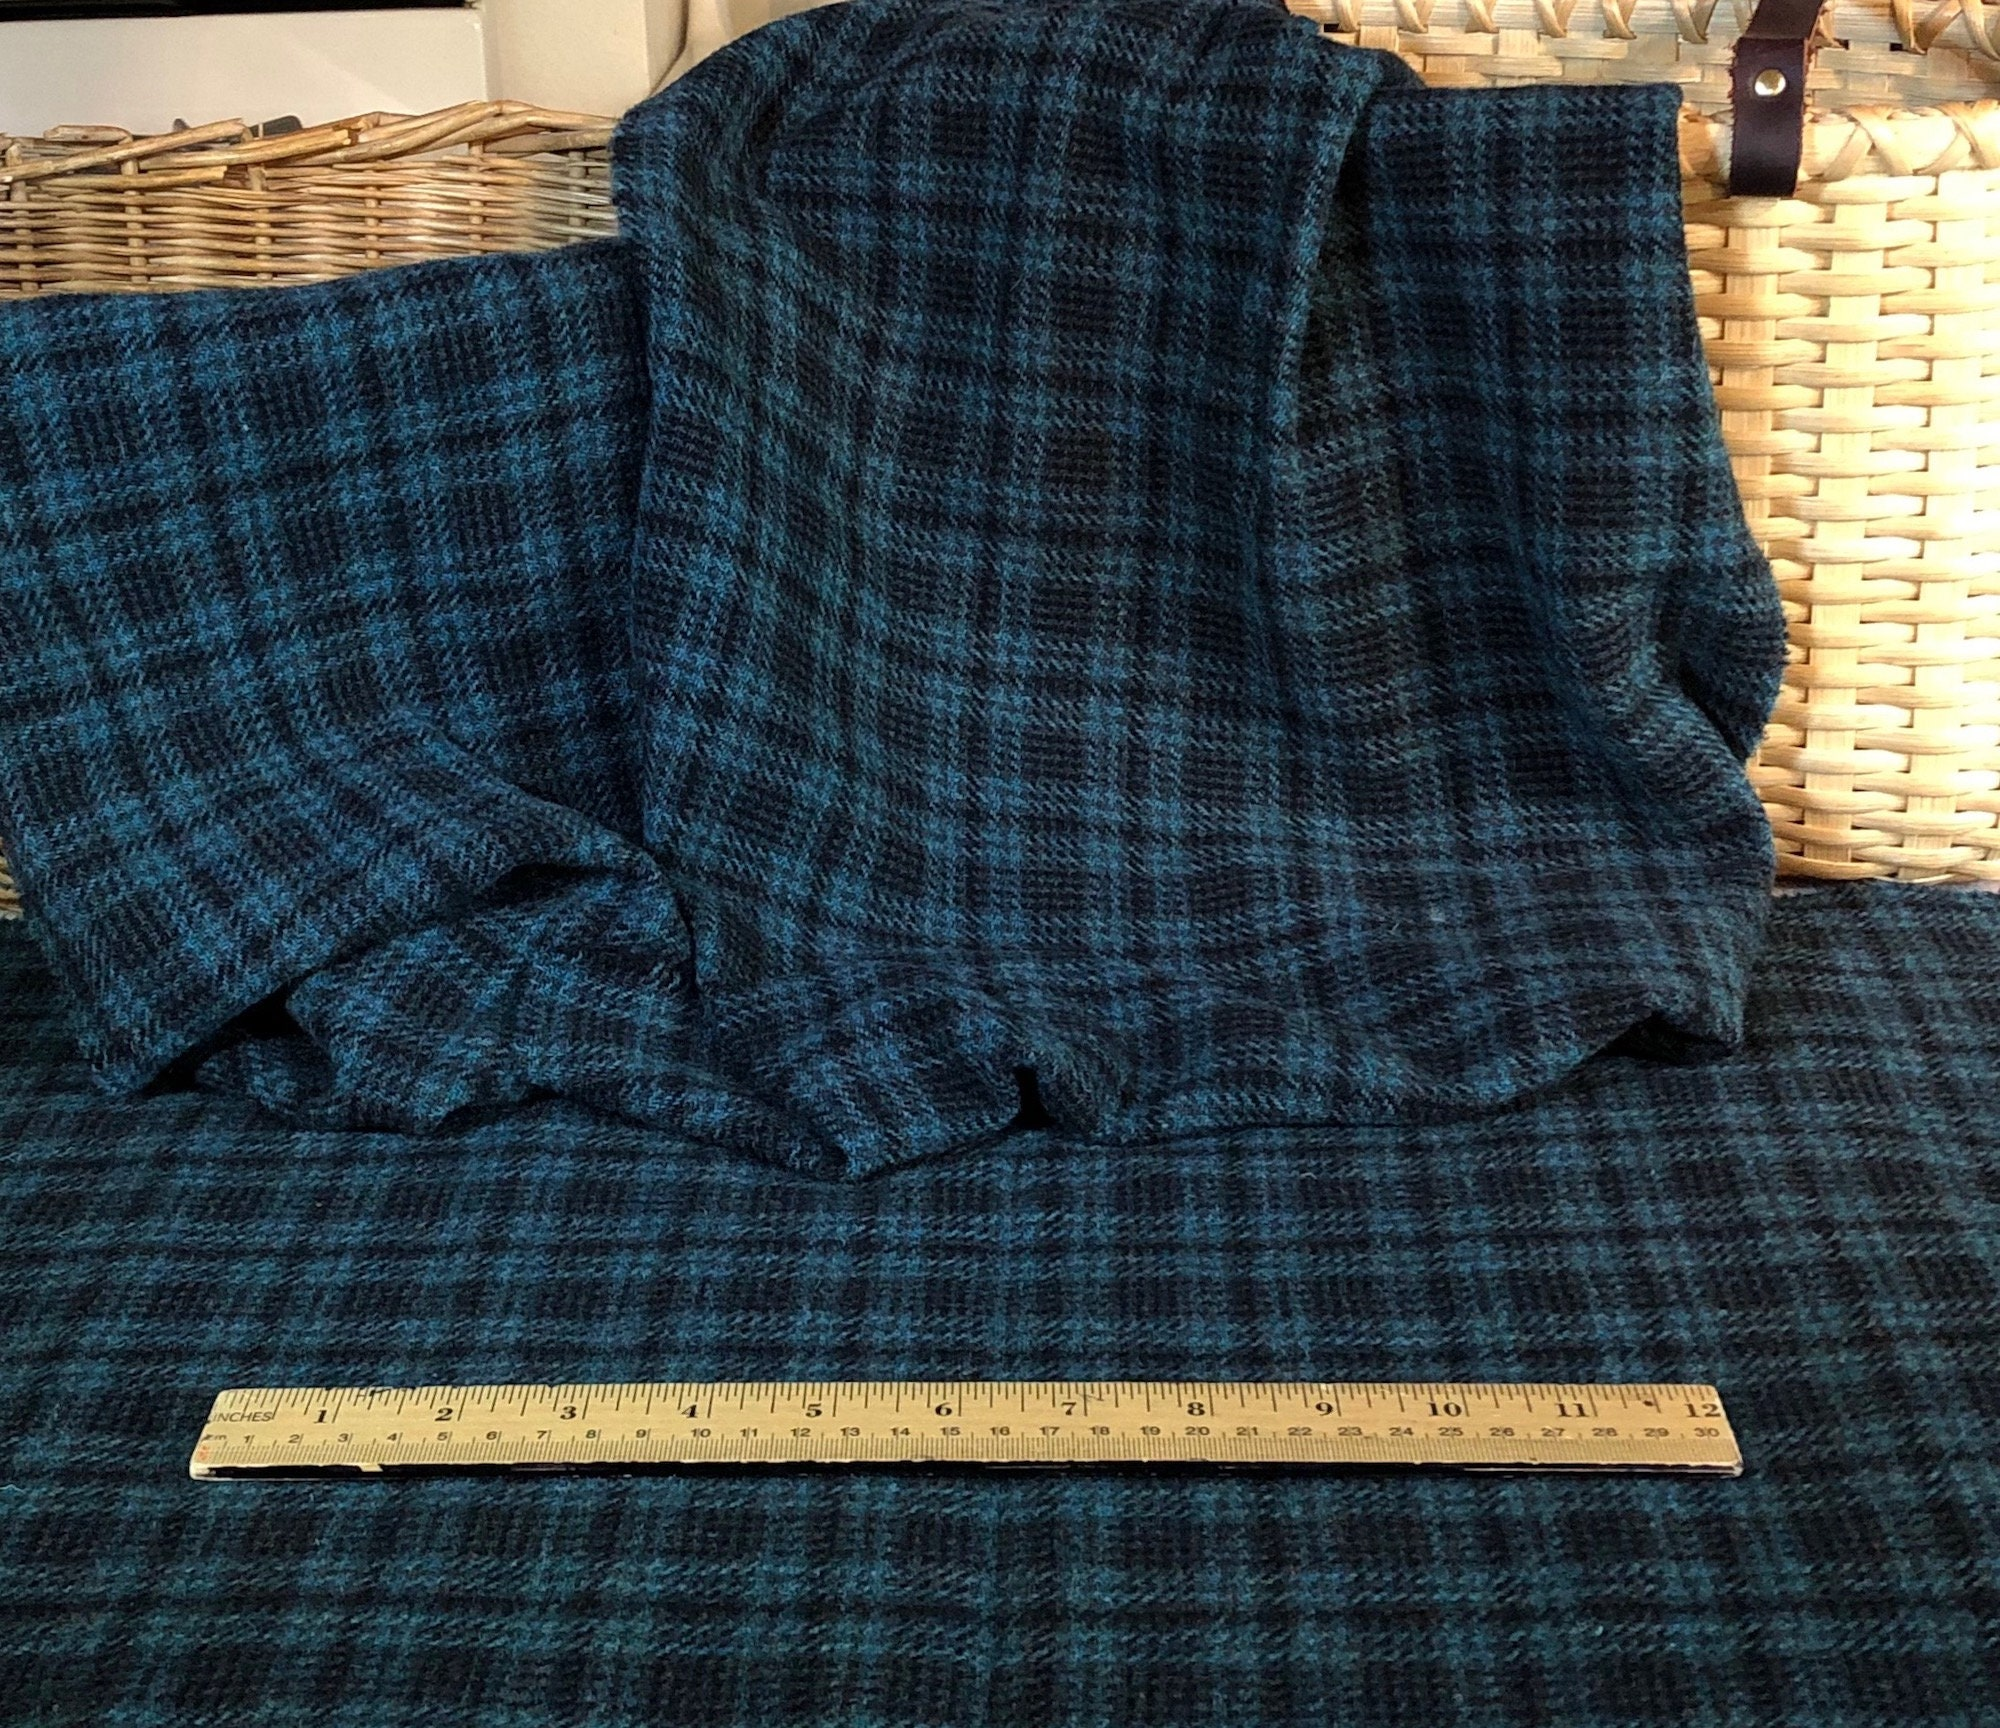 Sea Dragon, A Teal Dark Plaid, Mill Dyed 100% Wool Fabric